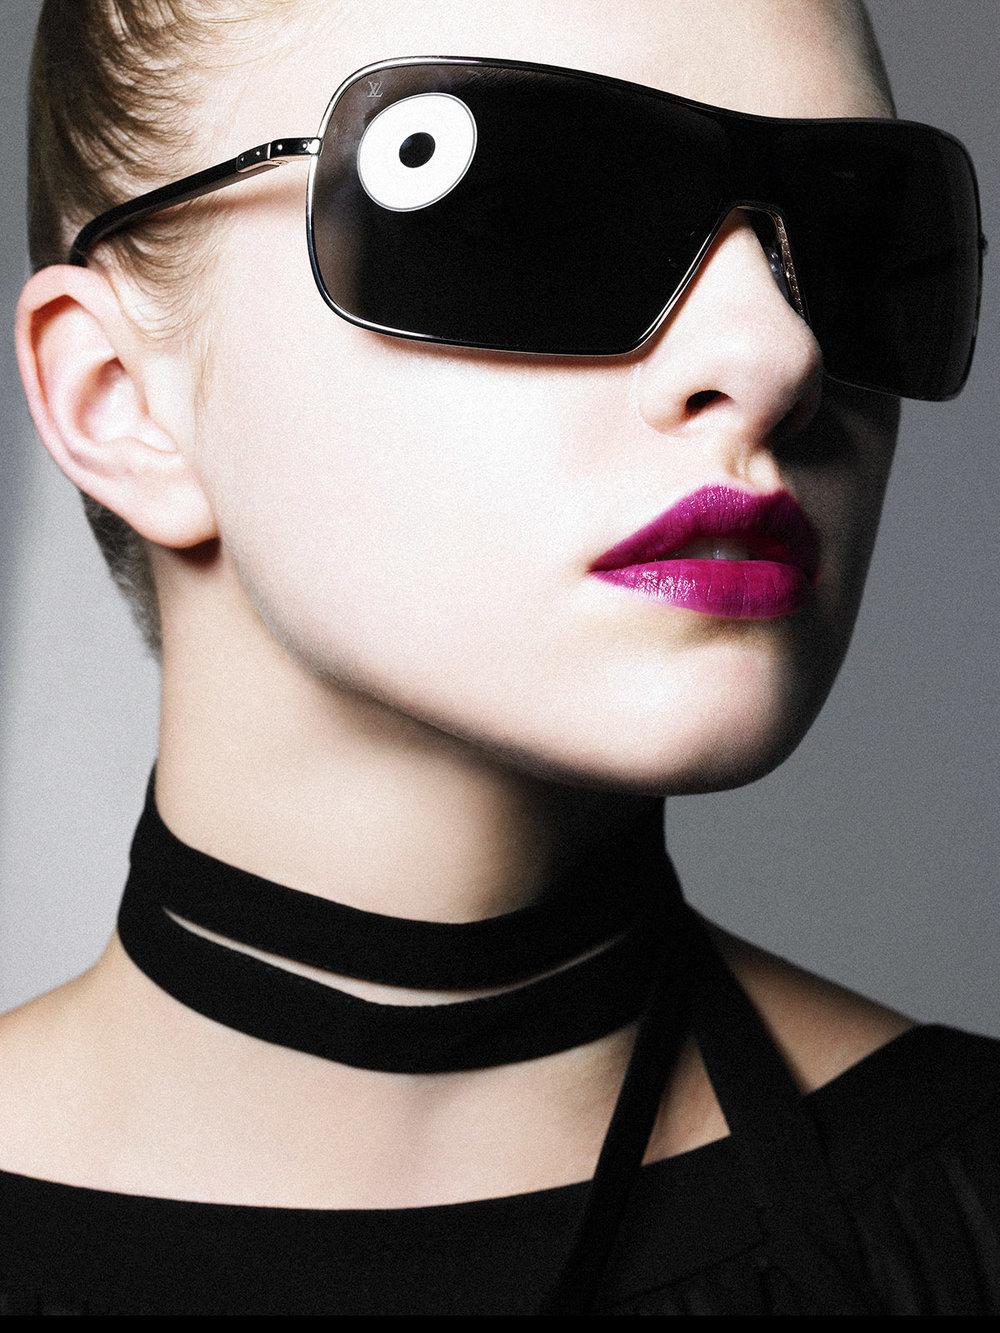 kwp-style-lip-2.jpg